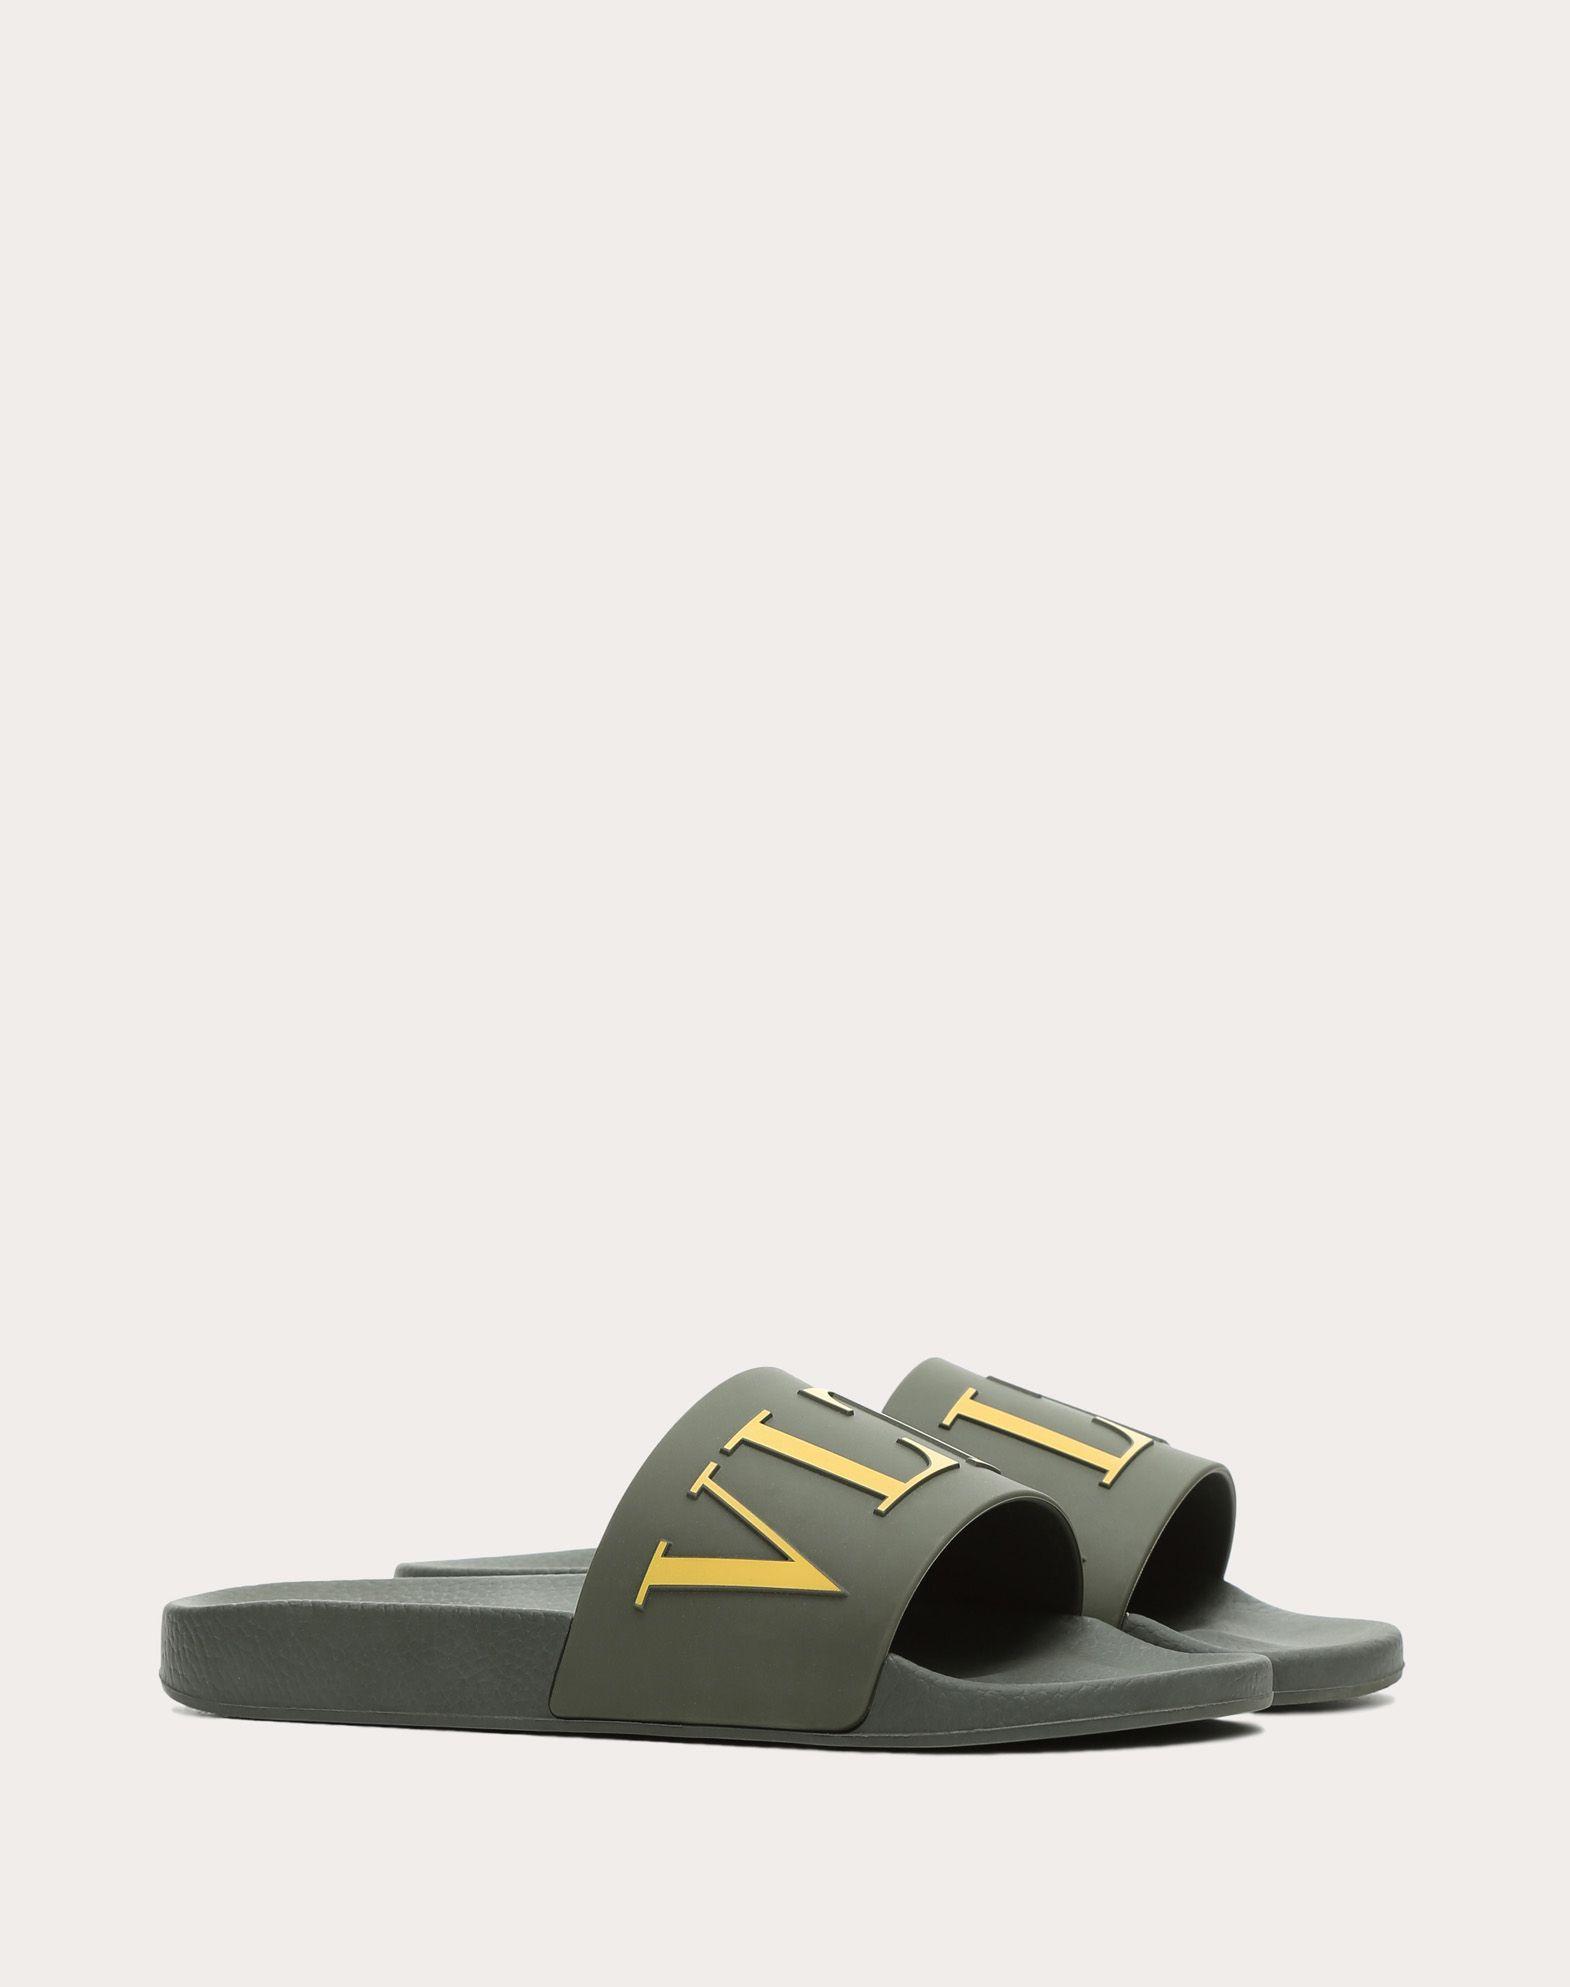 VALENTINO GARAVANI UOMO PY0S0873SYE GRE 橡胶拖鞋式凉鞋 U r